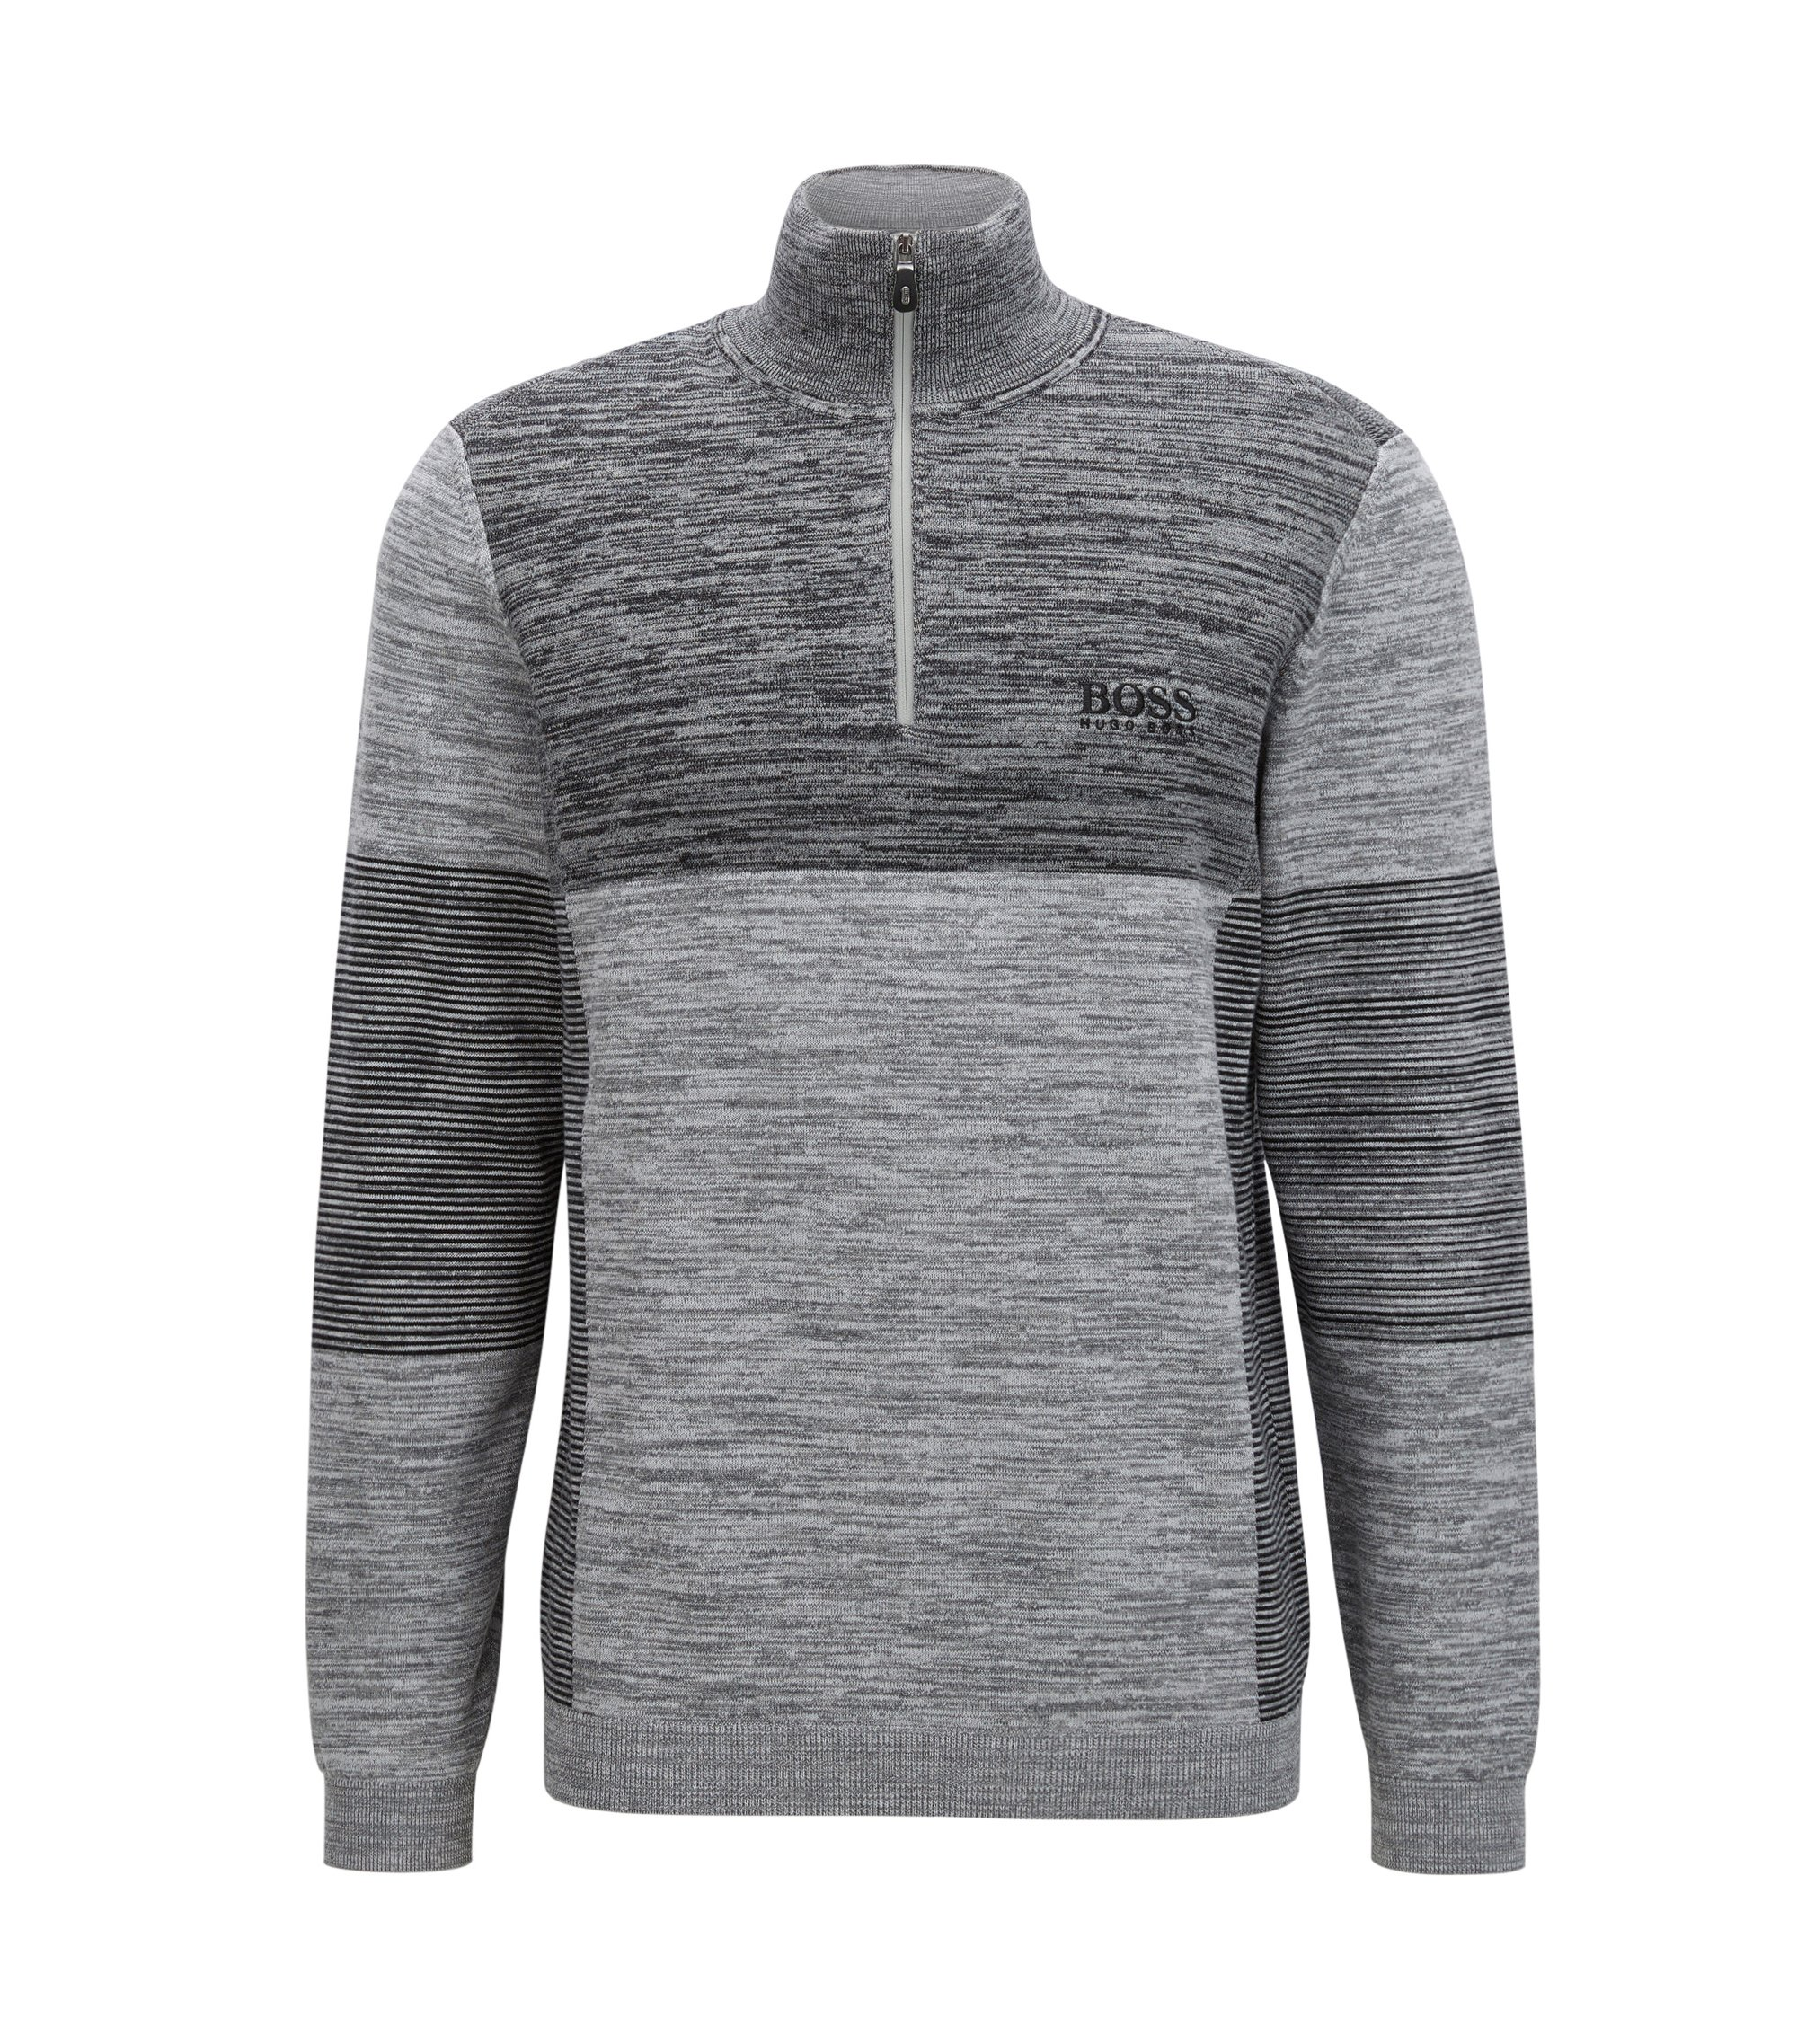 Colorblocked Melange Stretch Cotton Half-Zip Sweater   Zadok Pro, Light Grey